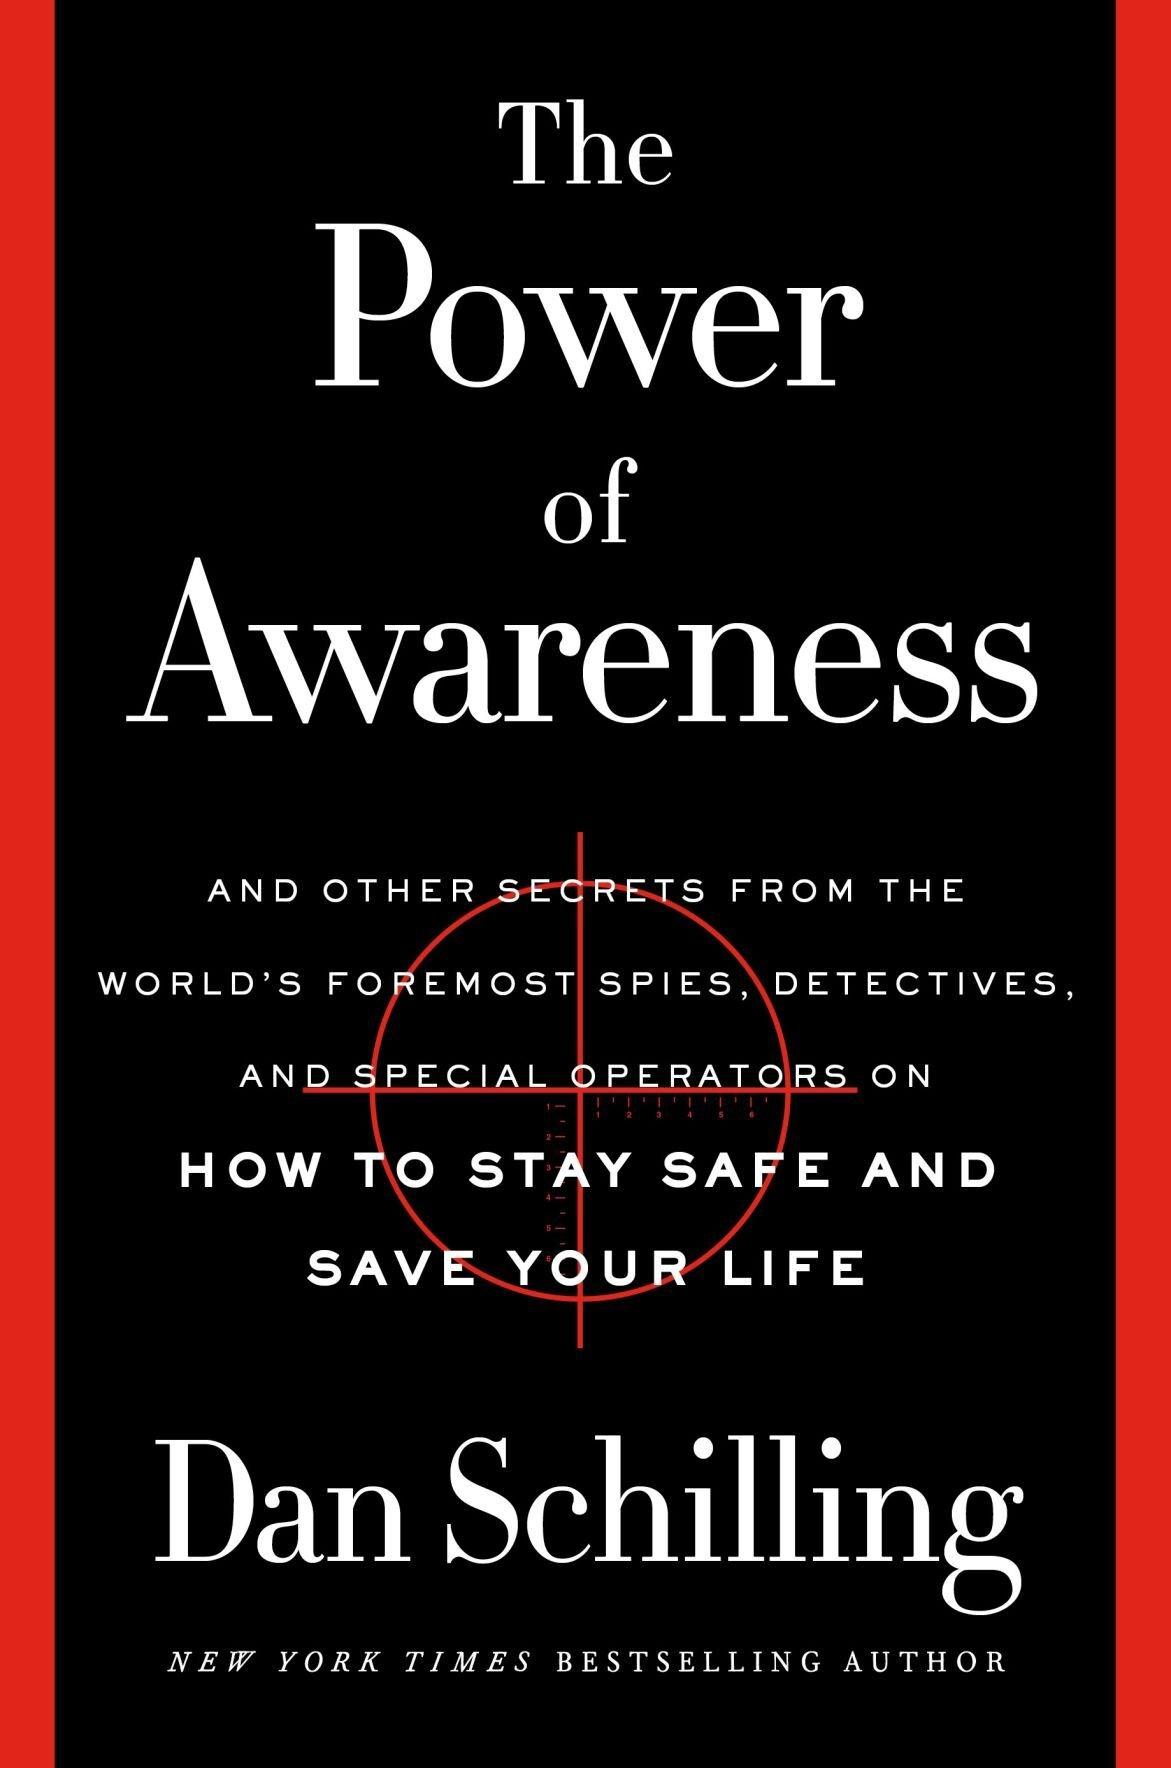 Power of Awareness.jpg